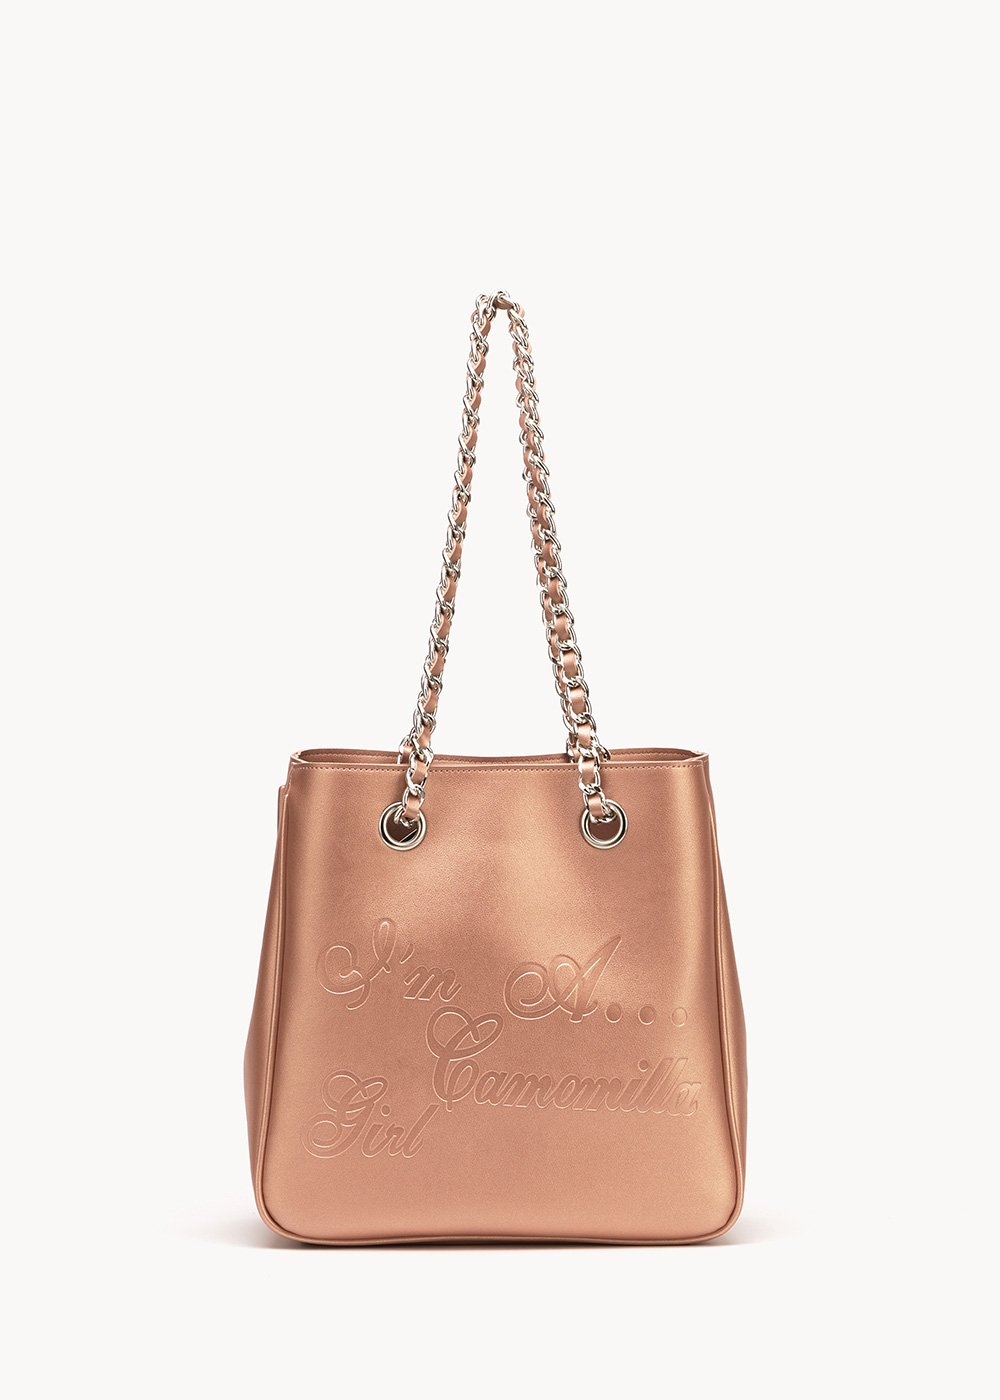 Shopping bag Mini Camo Girl in eco pelle con logo embossed - Gold Rose - Donna